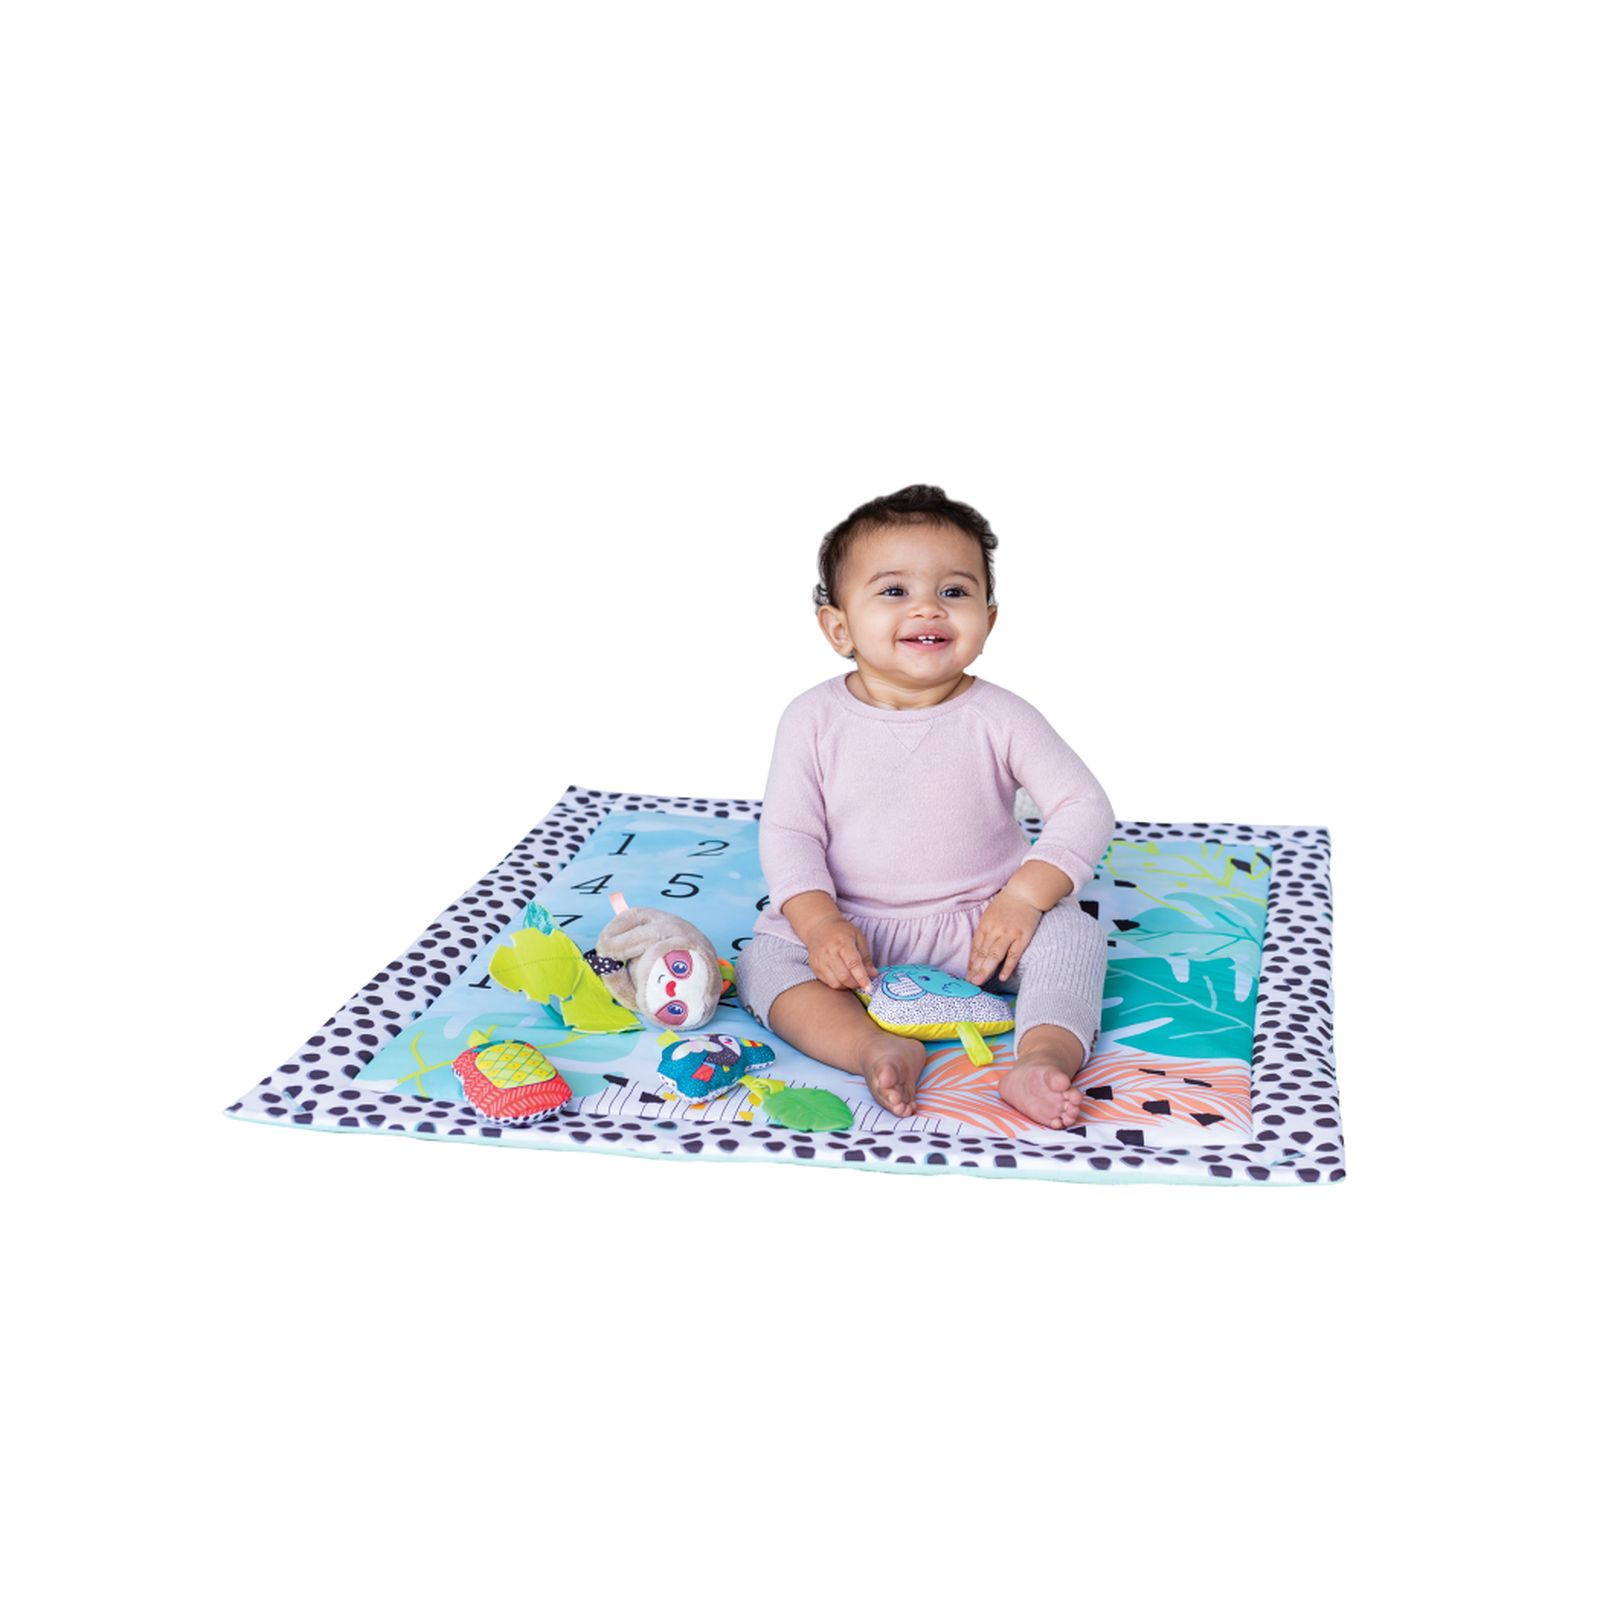 Palestrina e tappeto gioco - INFANTINO